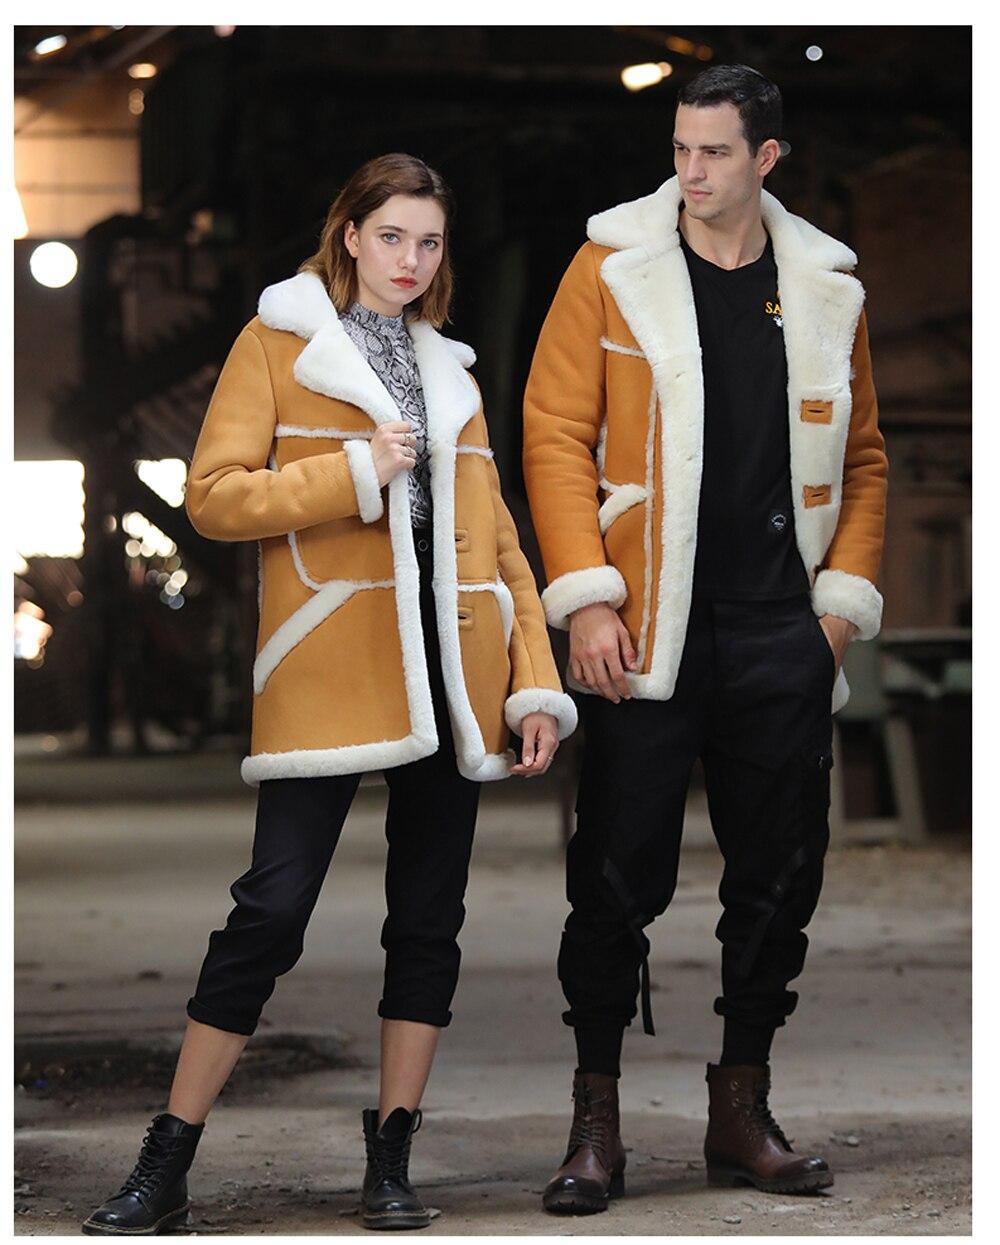 Hd72010e516e14935a277f26fc37e15bbX Men Luxury Fur Shearling Coat Yellow Soft Thicken Fur Coat Winter Male Formal Business Fur Sheepskin Jackets